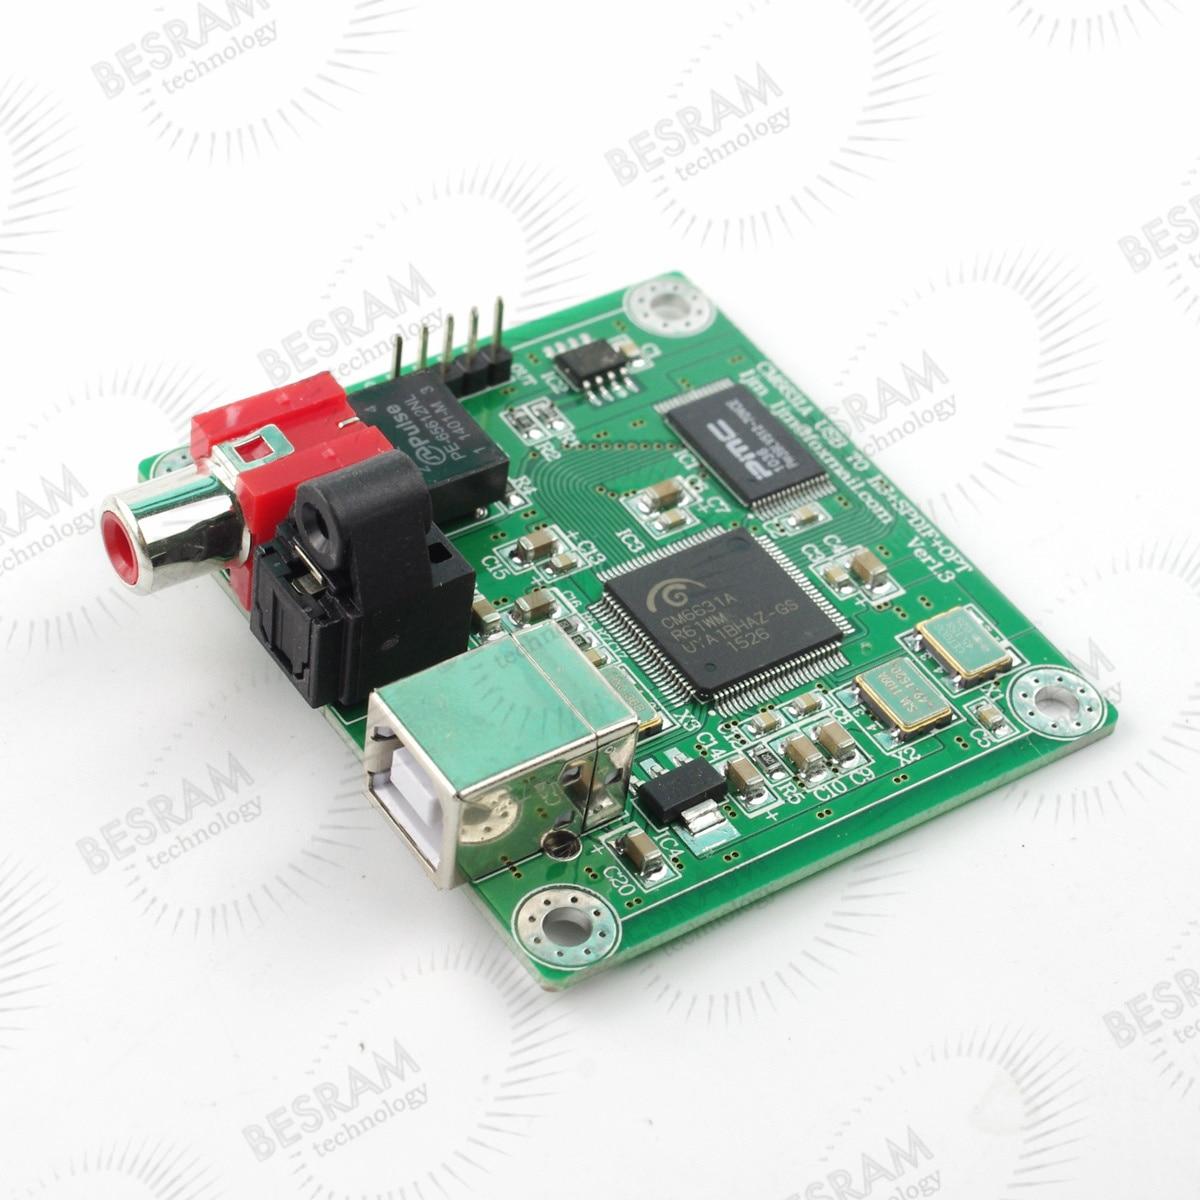 24bit/192khz USB to Coaxial/Optical fiber SPDIF I2S Converter DAC Board CM6631A<br><br>Aliexpress